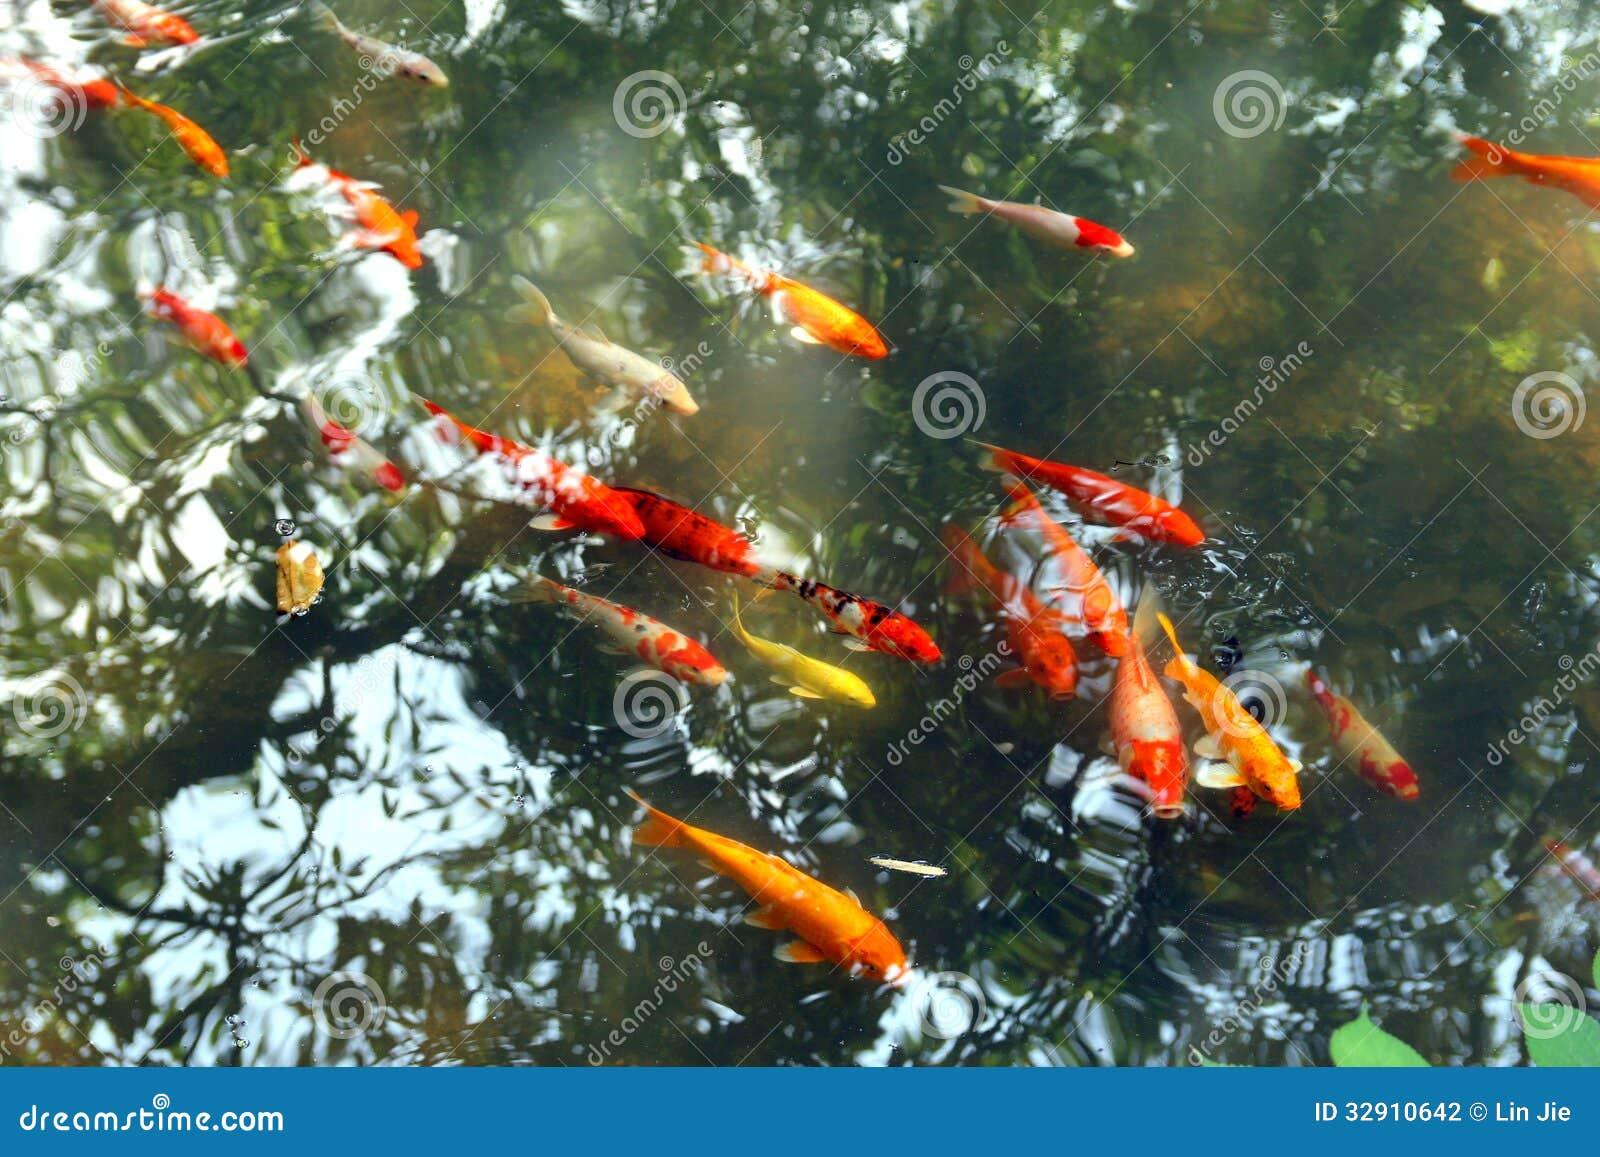 Fish shallow stock photography image 32910642 for Shallow koi pond